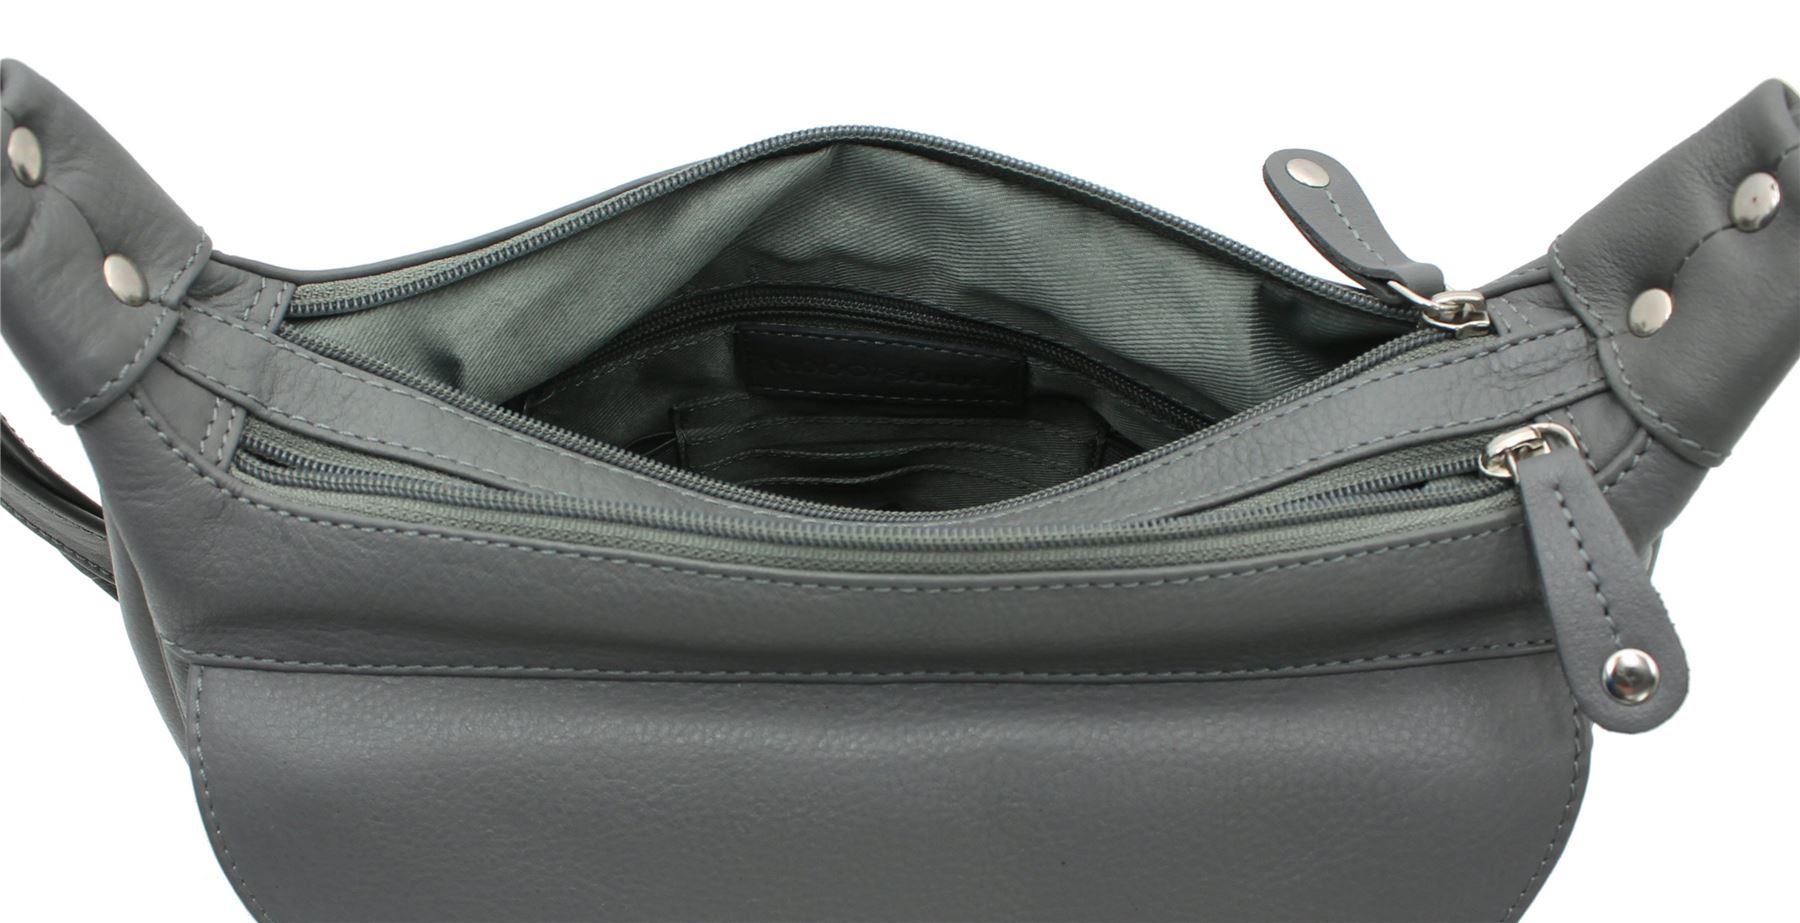 Bolla Bags Wimborne Collection PILFORD Single Strap Leather Shoulder Shoulder Shoulder Bag | Gewinnen Sie hoch geschätzt  5ce350